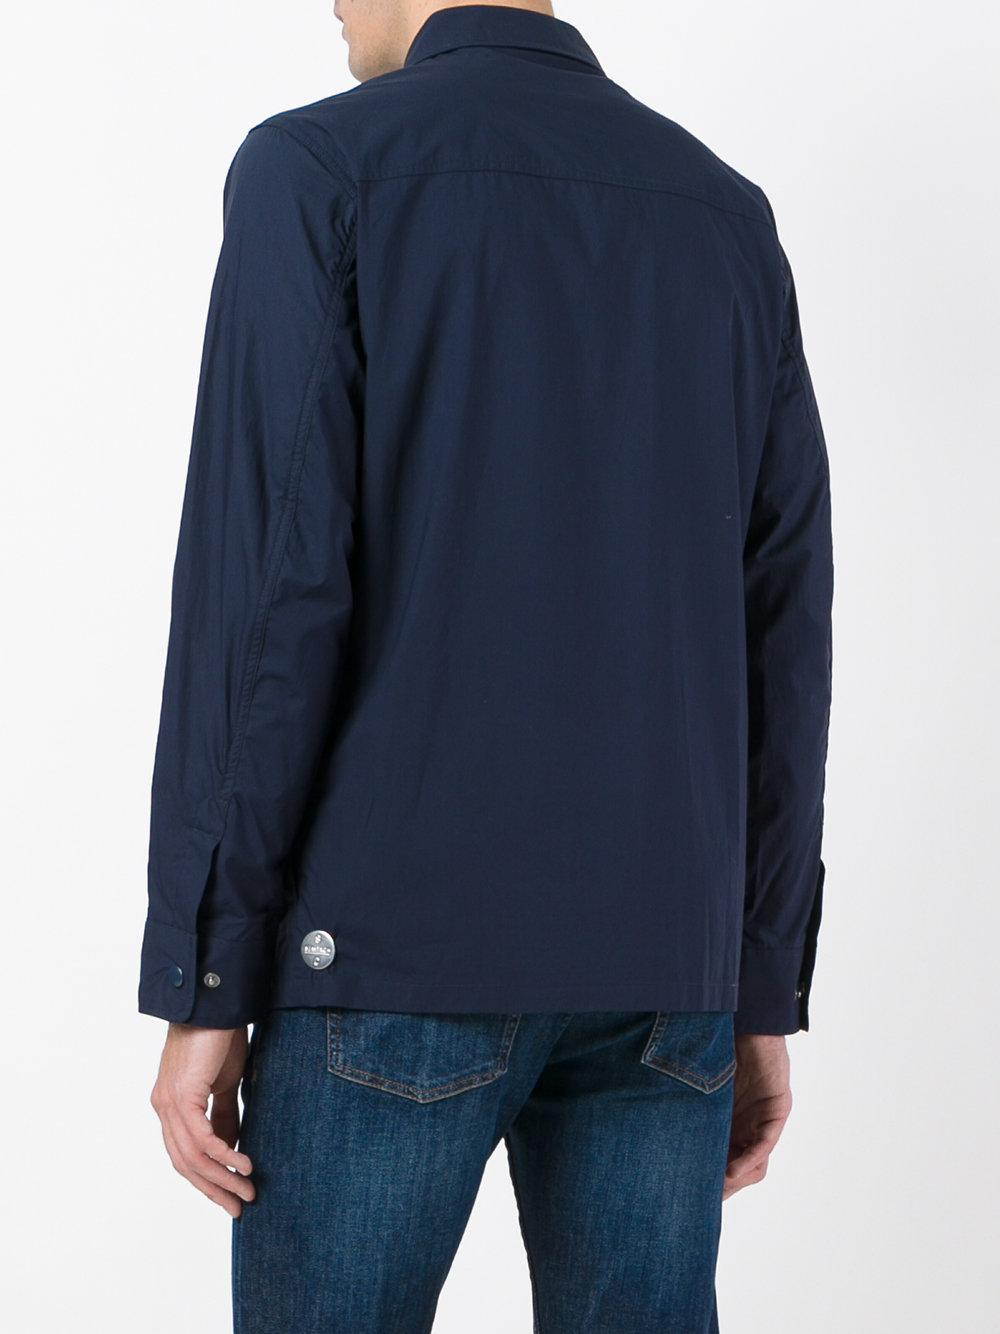 Sempach Cotton 'compass' Shirt Jacket in Blue for Men